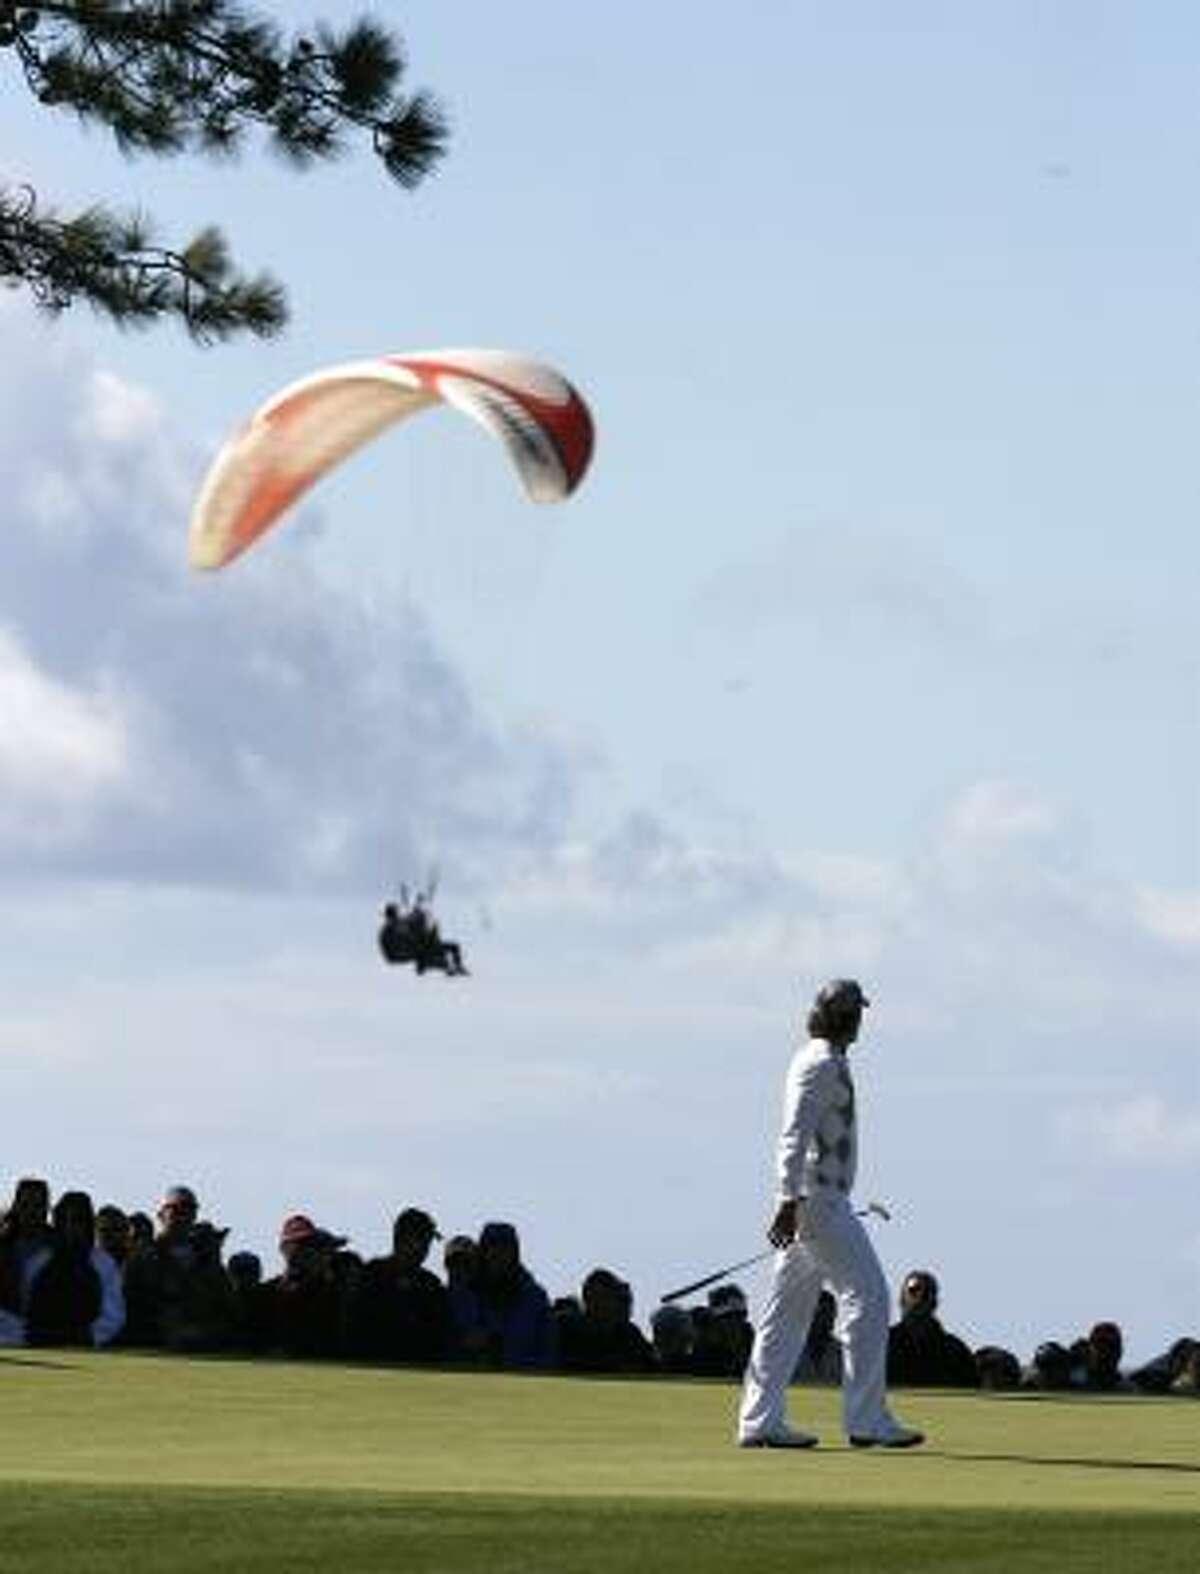 Camilo Villegas walks the 12th green as a glider floats overhead.